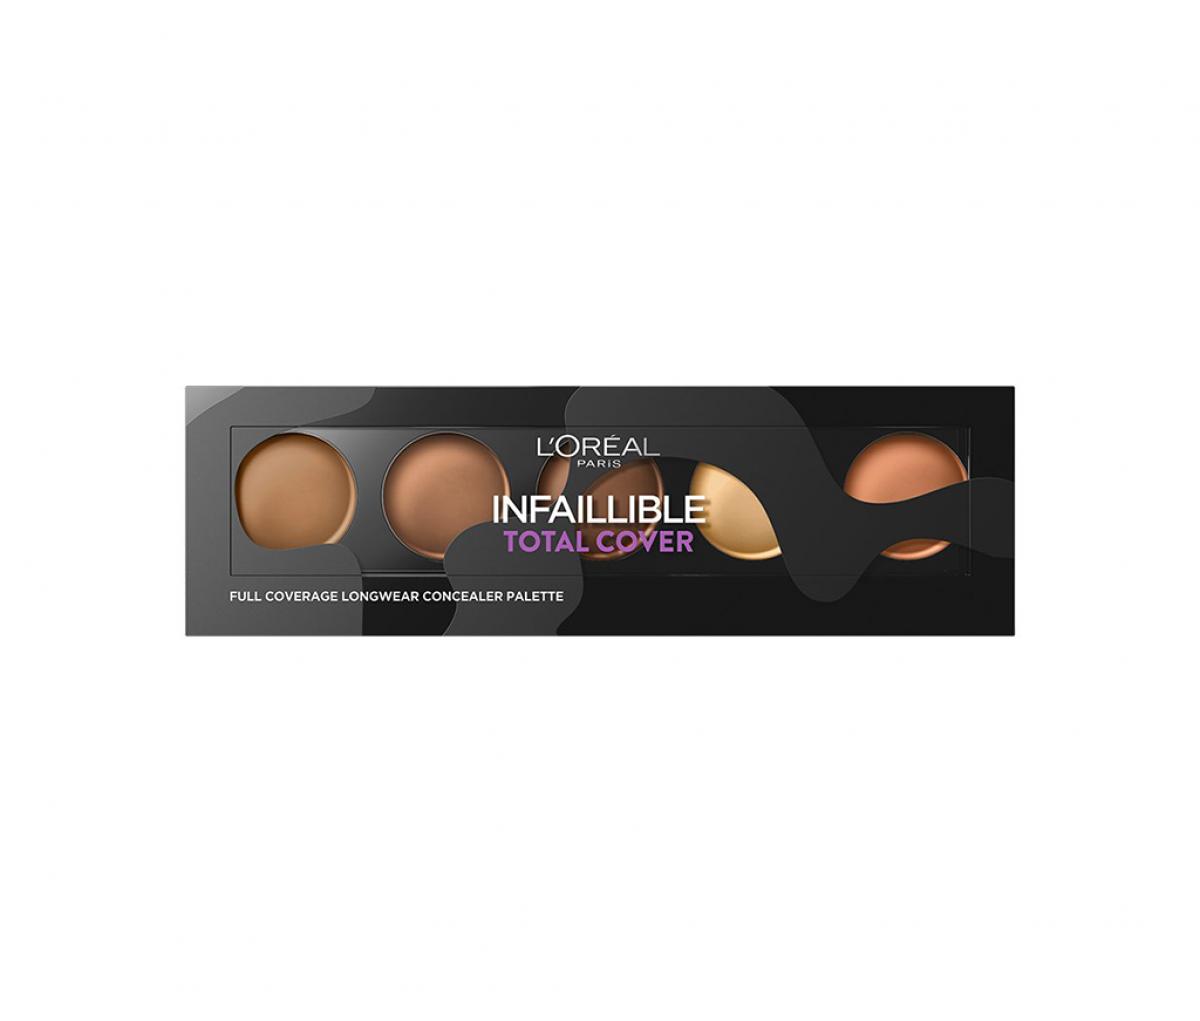 L'Oreal Infaillible Total Cover Concealer Palette